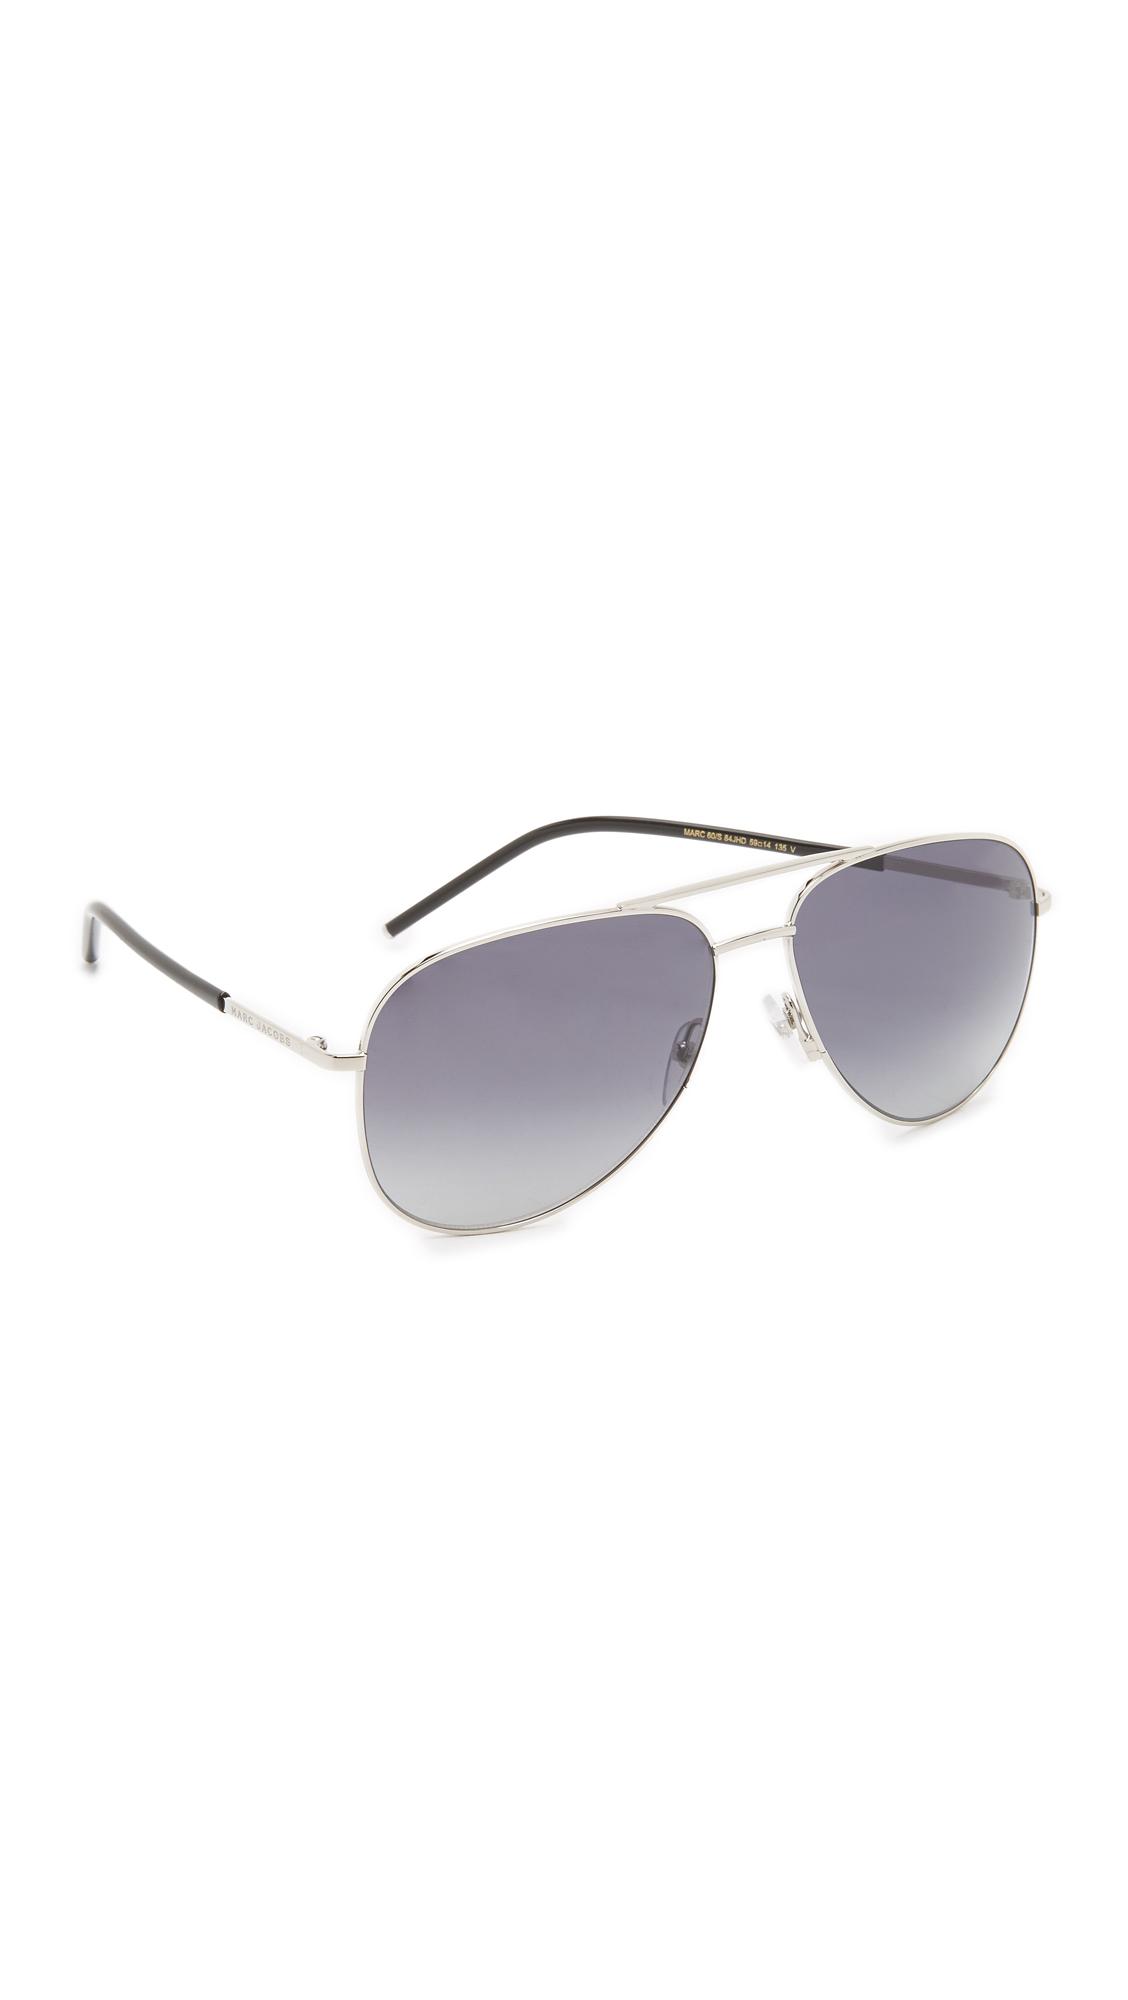 9e0ddfbaa59 Lyst - Marc Jacobs Easy To Wear Aviator Sunglasses in Blue